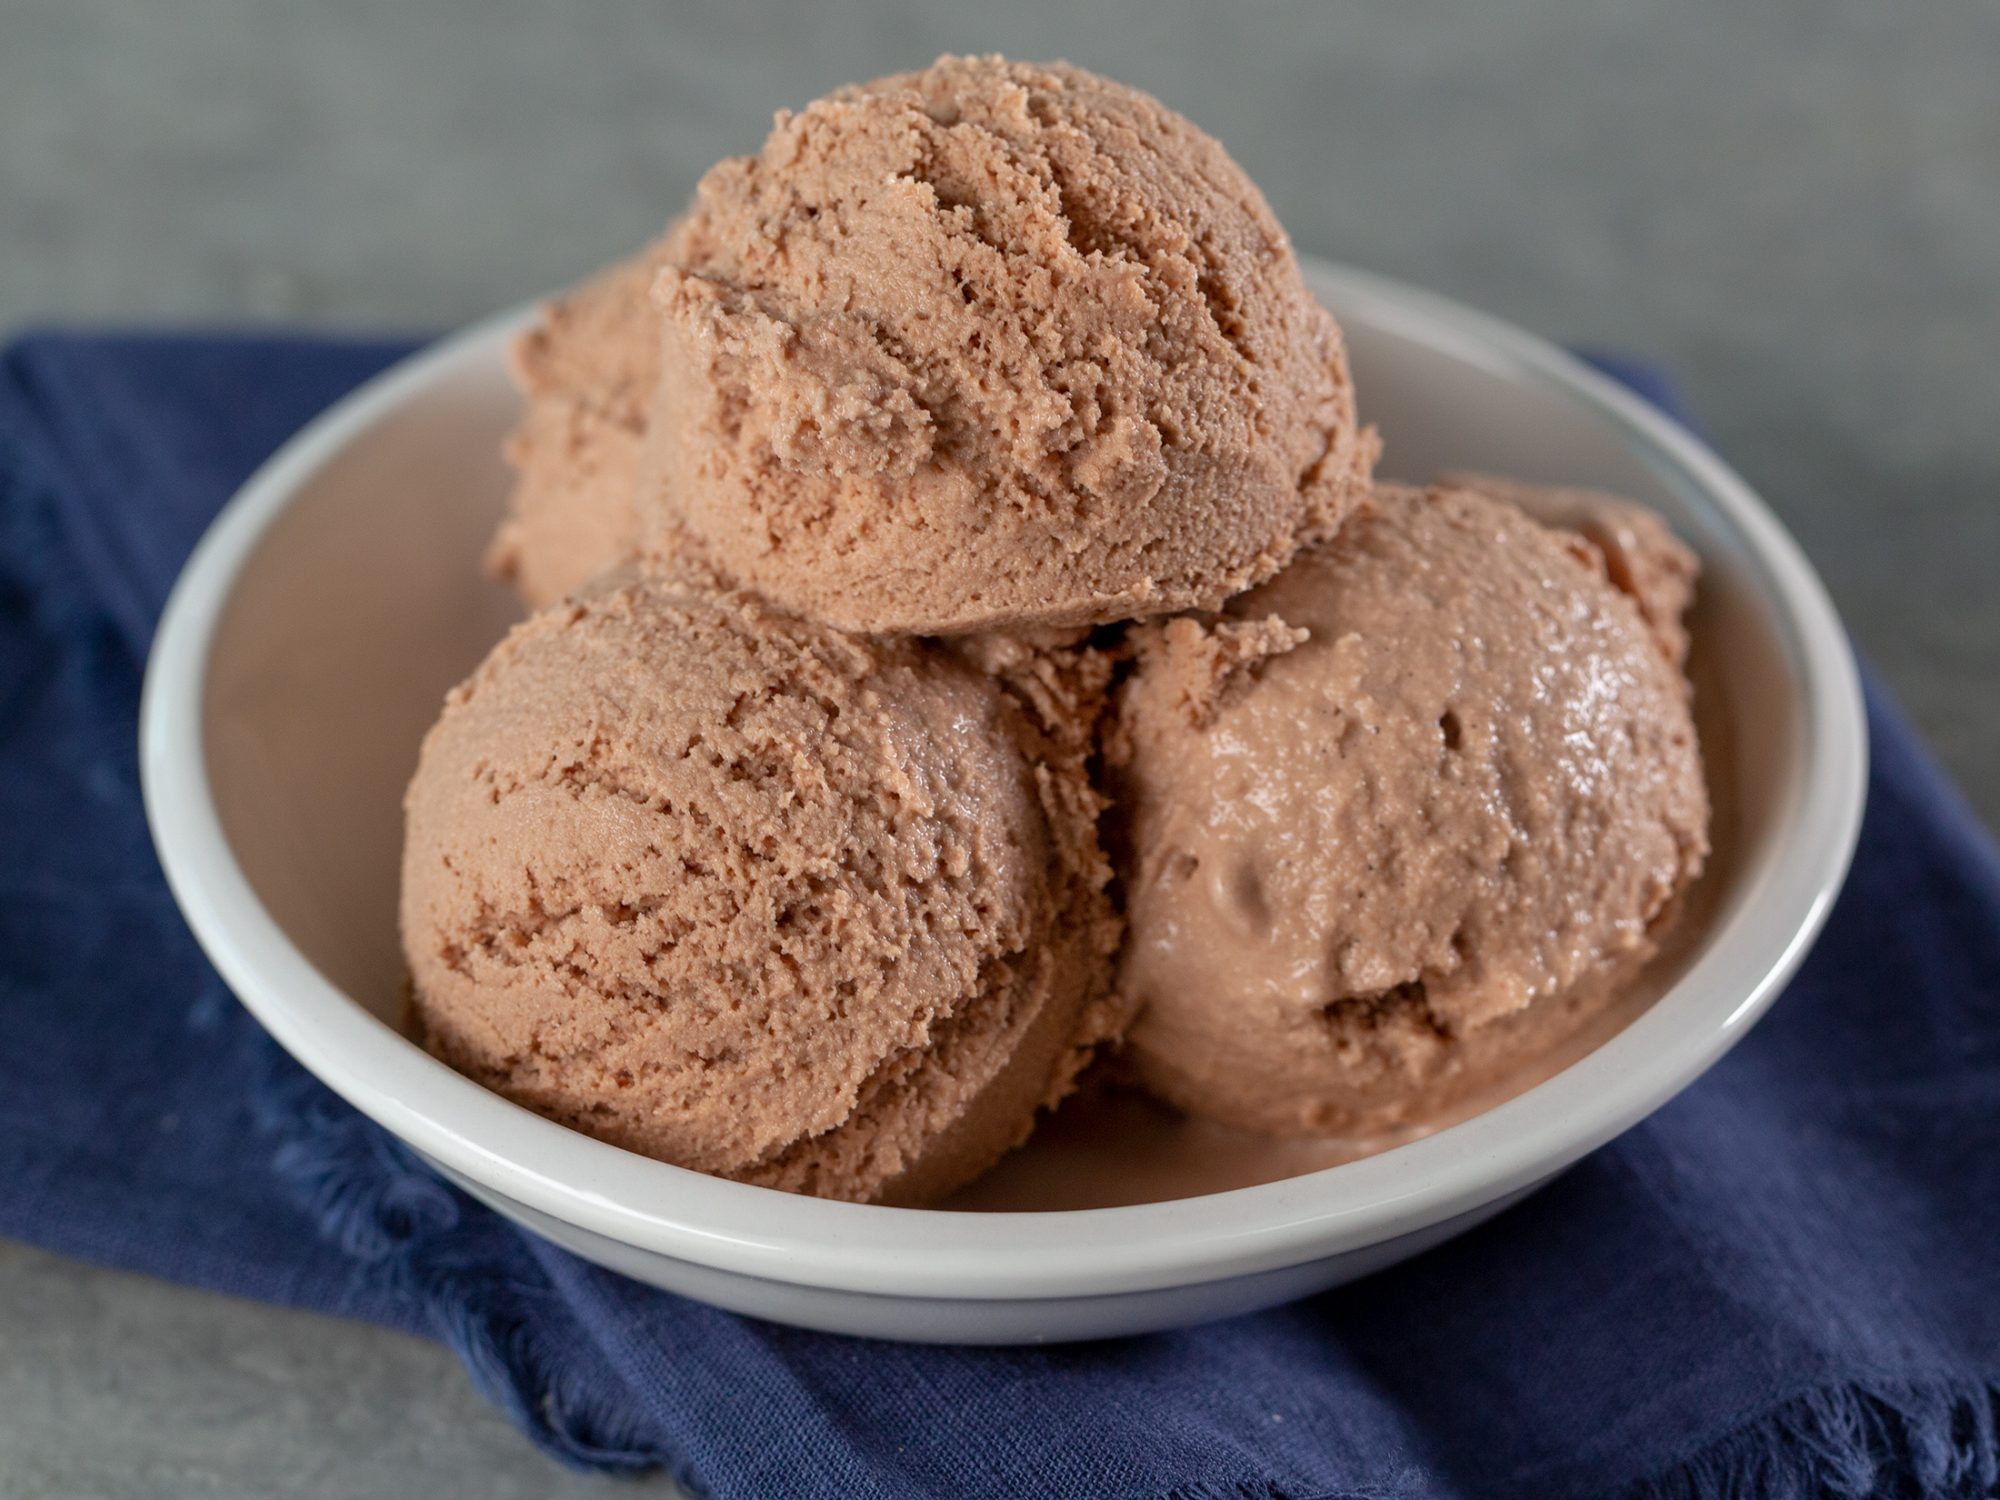 Keto Chocolate Ice Cream image